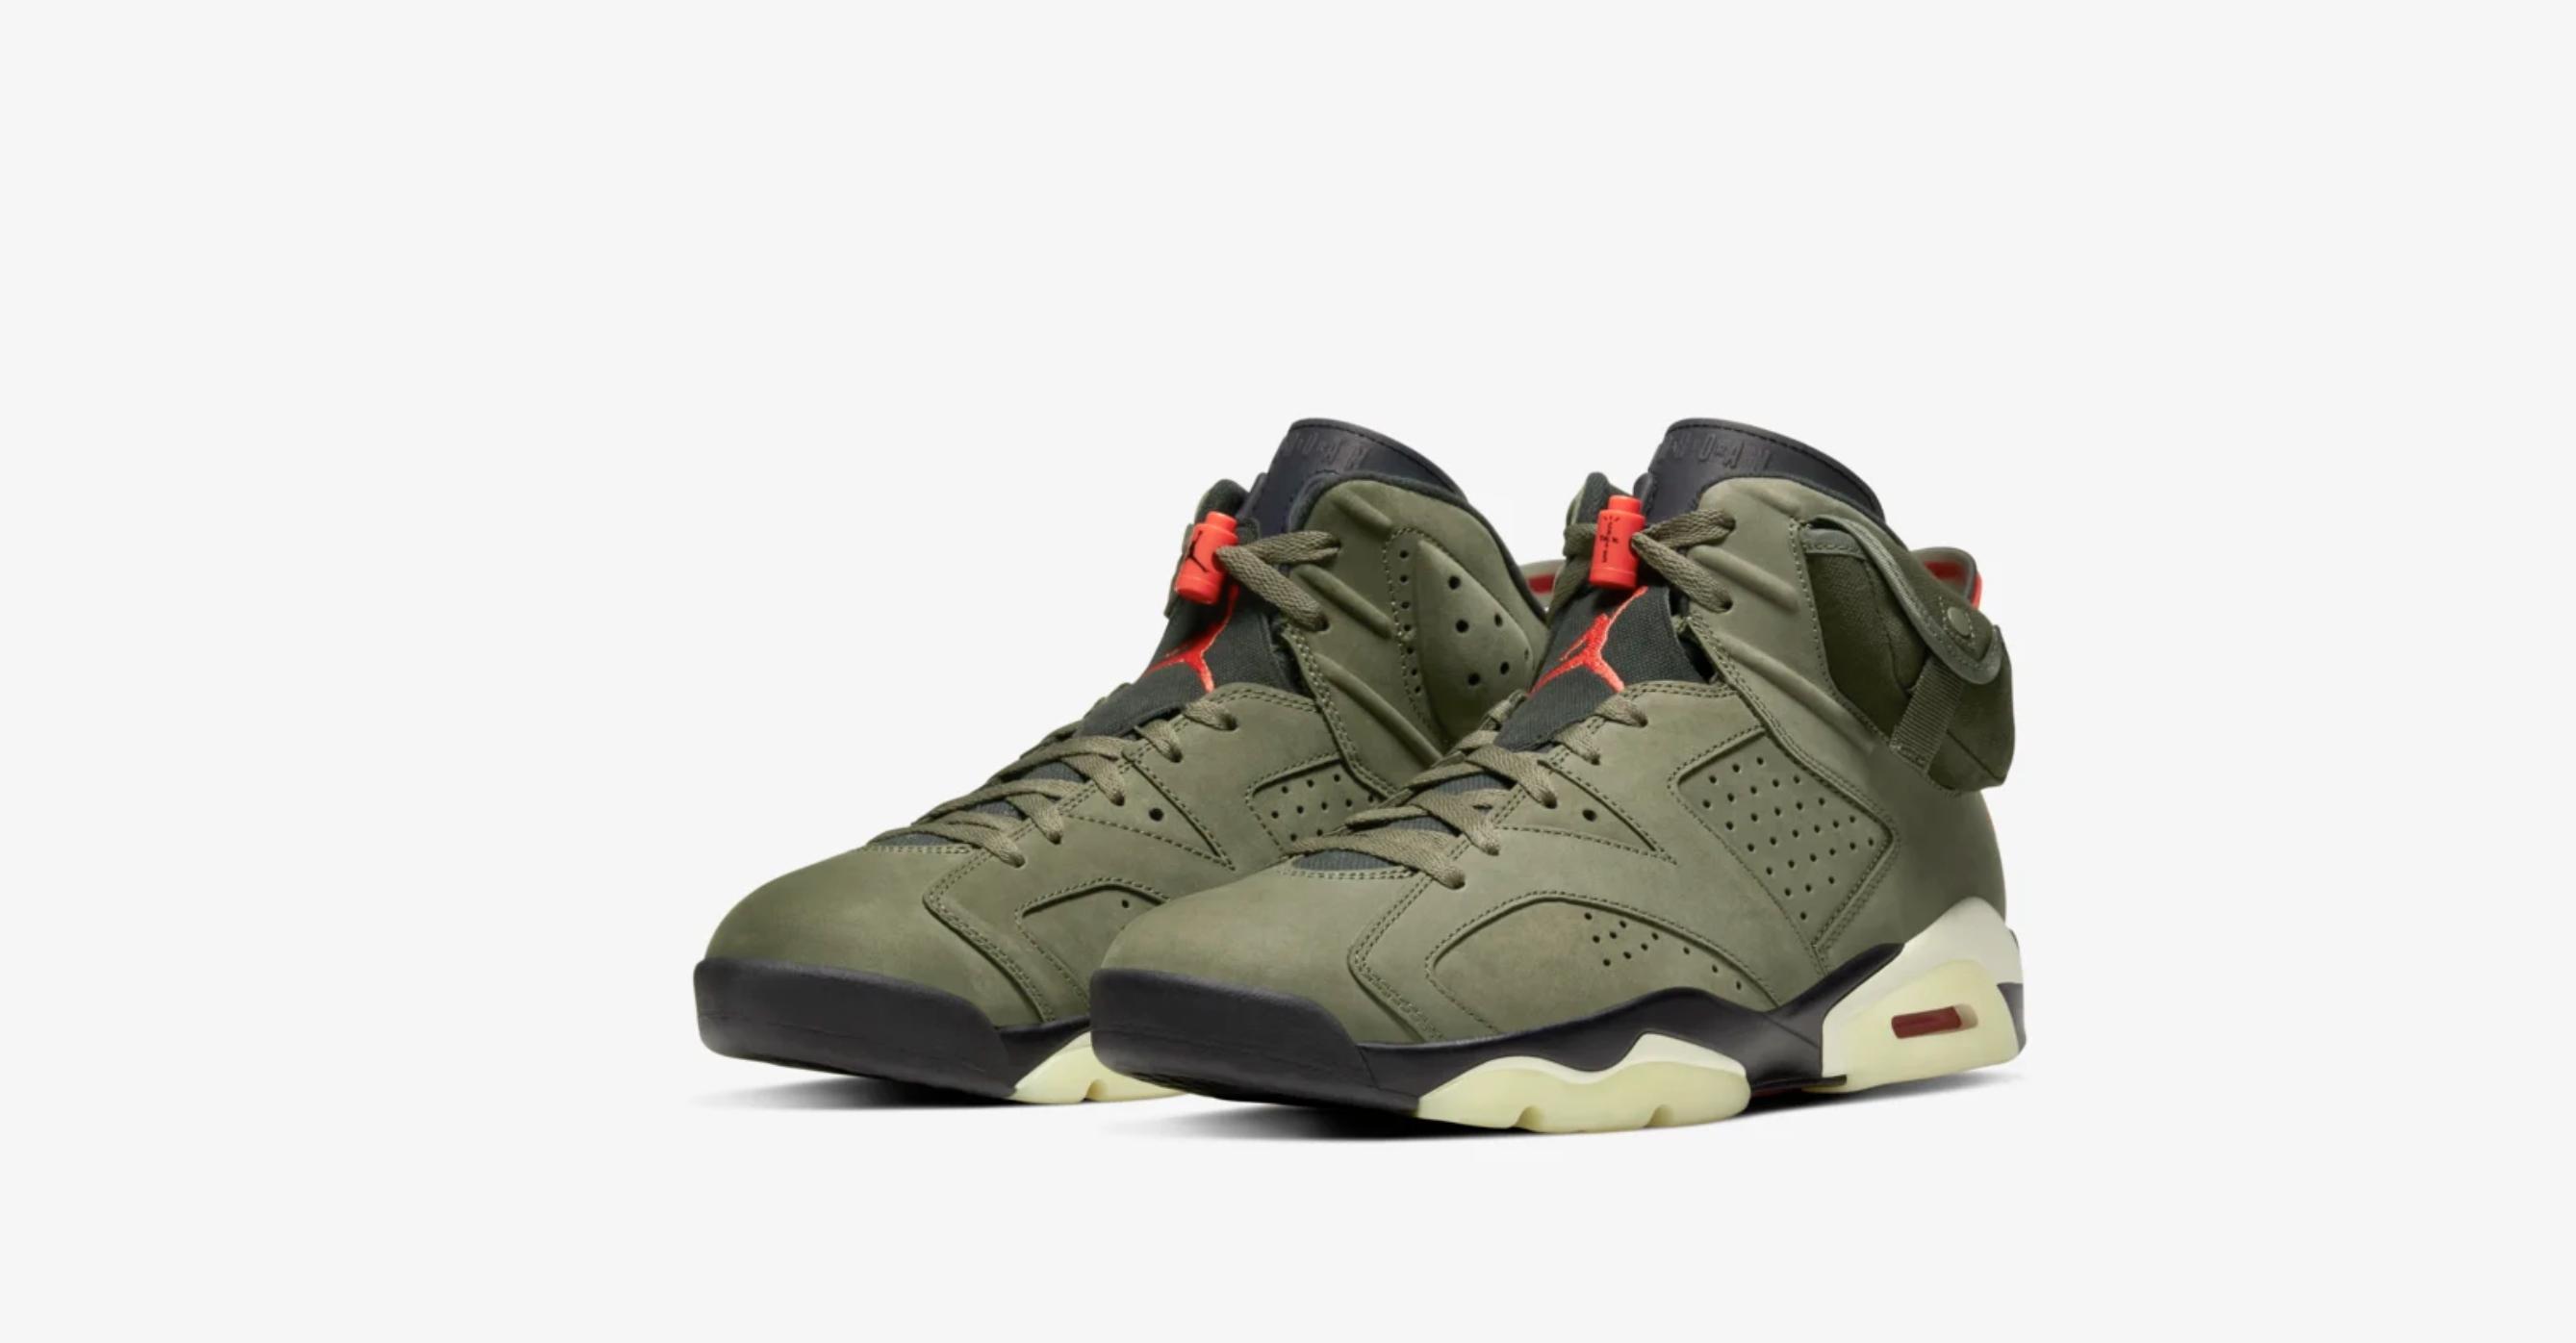 fresh styles best online sleek Where To Buy The New Travis Scott Jordans